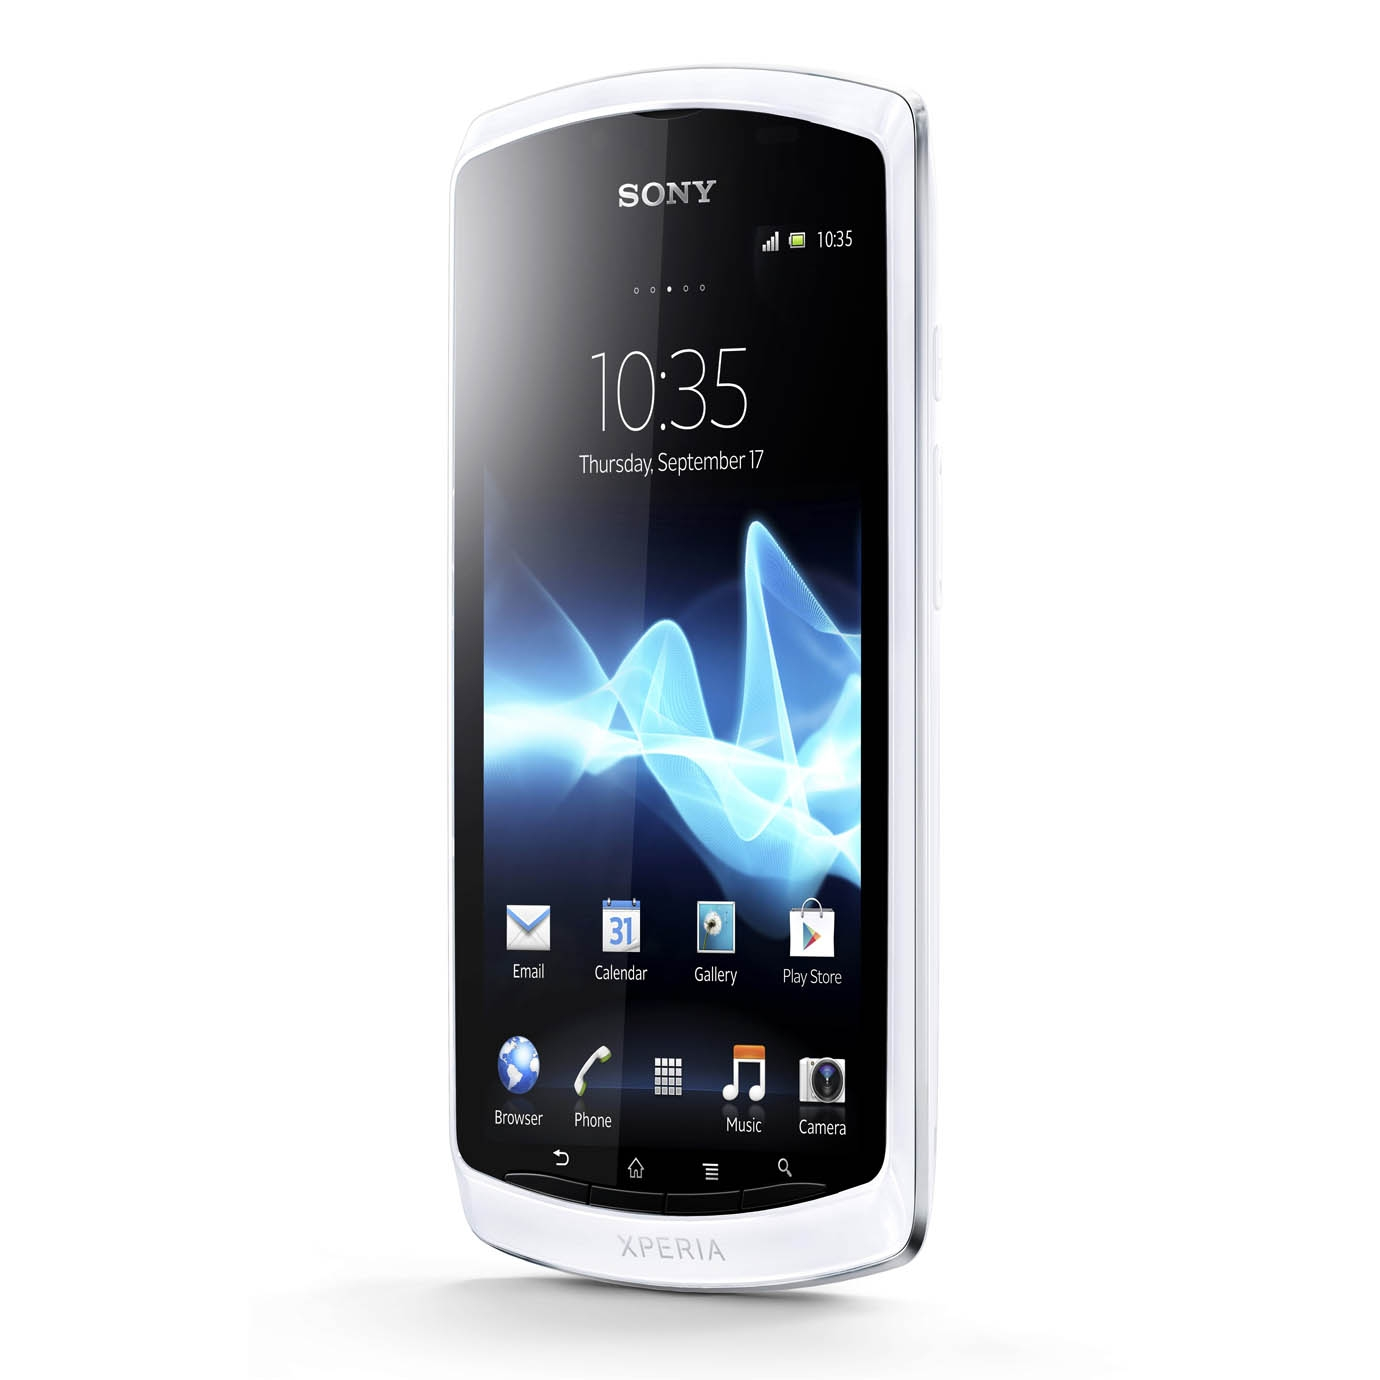 Harga Dan Spesifikasi Lengkap Sony Xperia Neo L